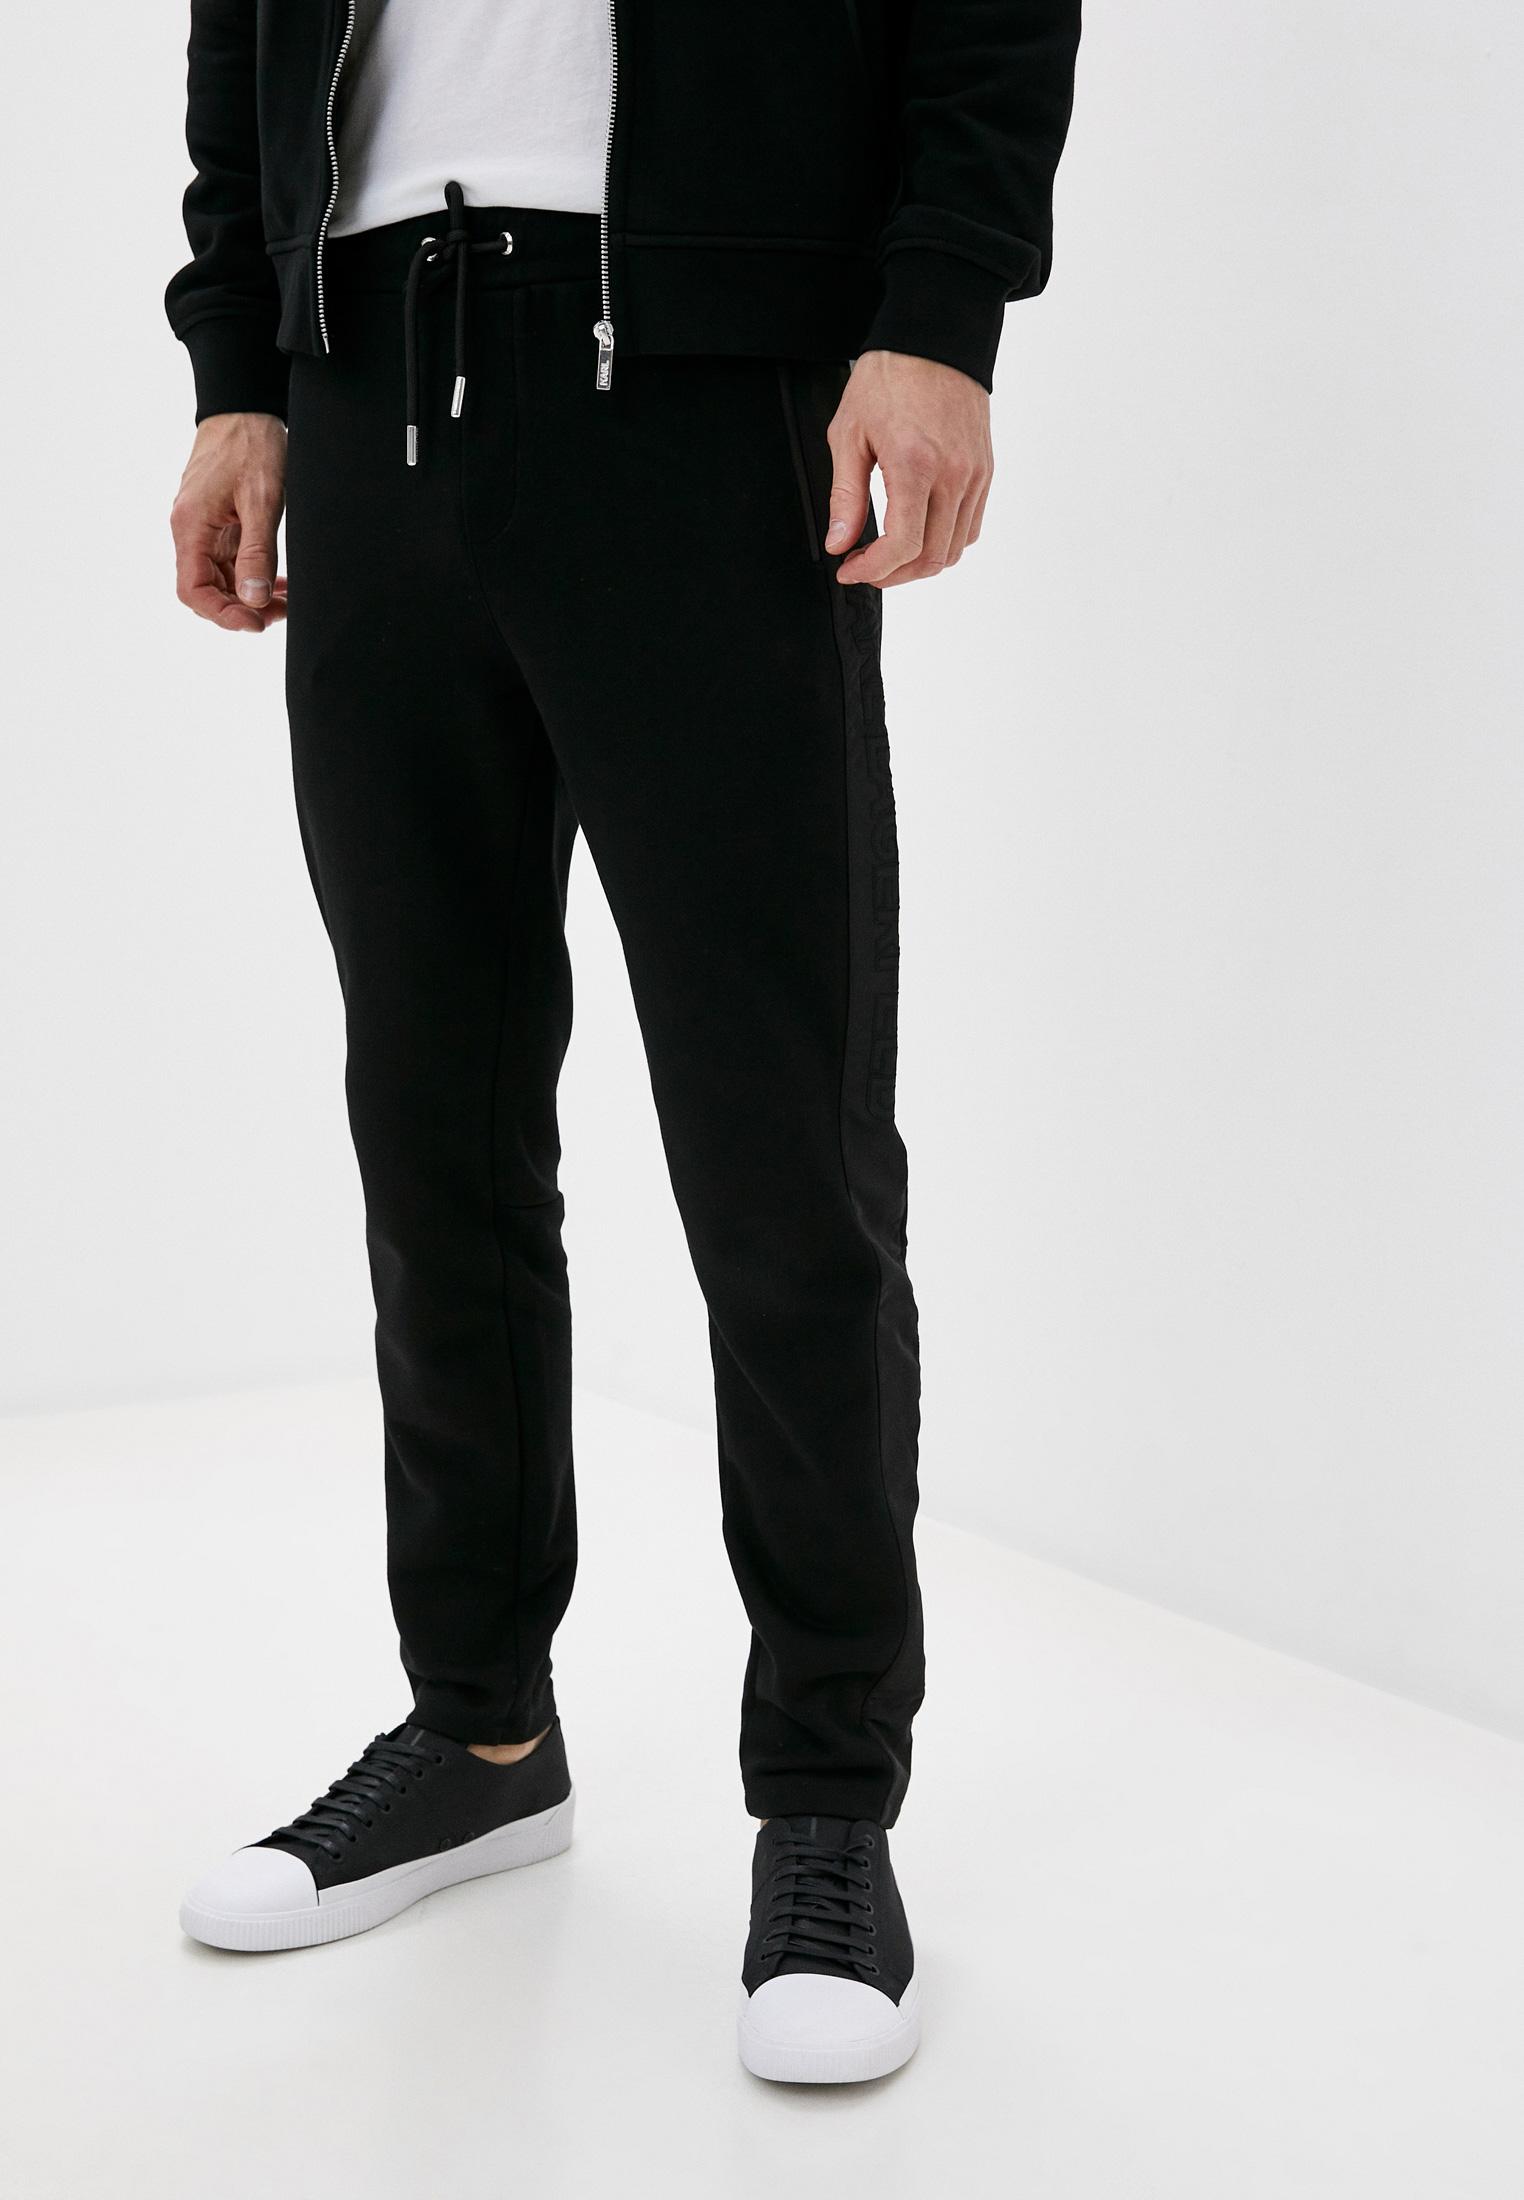 Мужские спортивные брюки Karl Lagerfeld (Карл Лагерфельд) 705028-502910